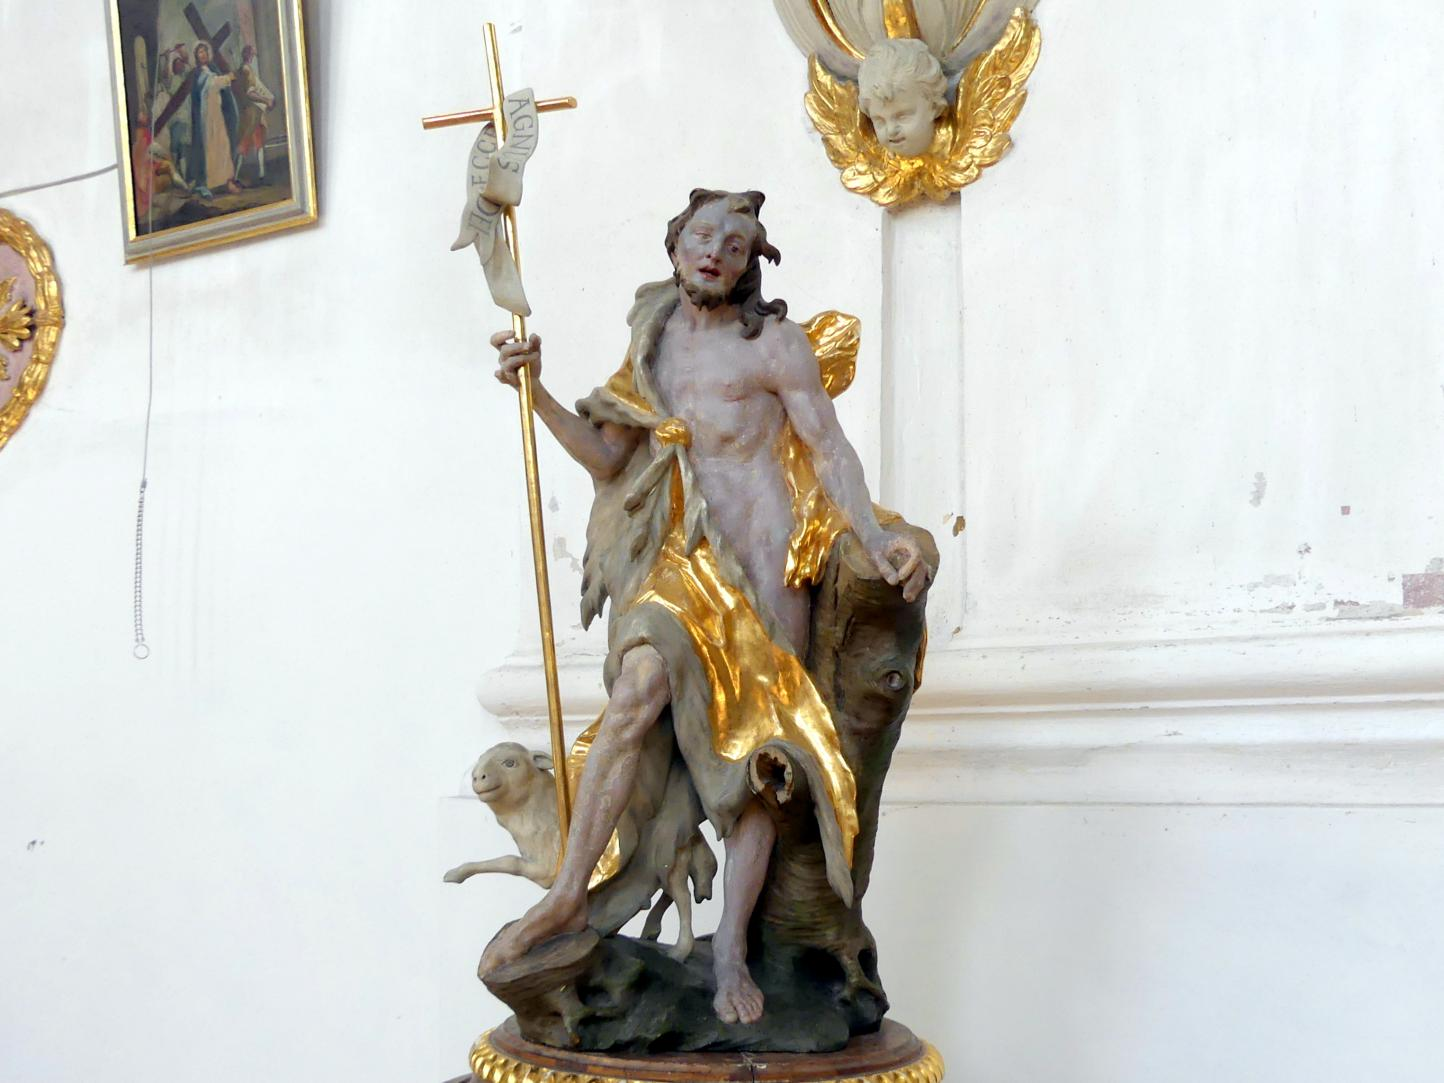 Christian Jorhan der Ältere: Johannes Baptist auf dem Taufdeckel, 1791